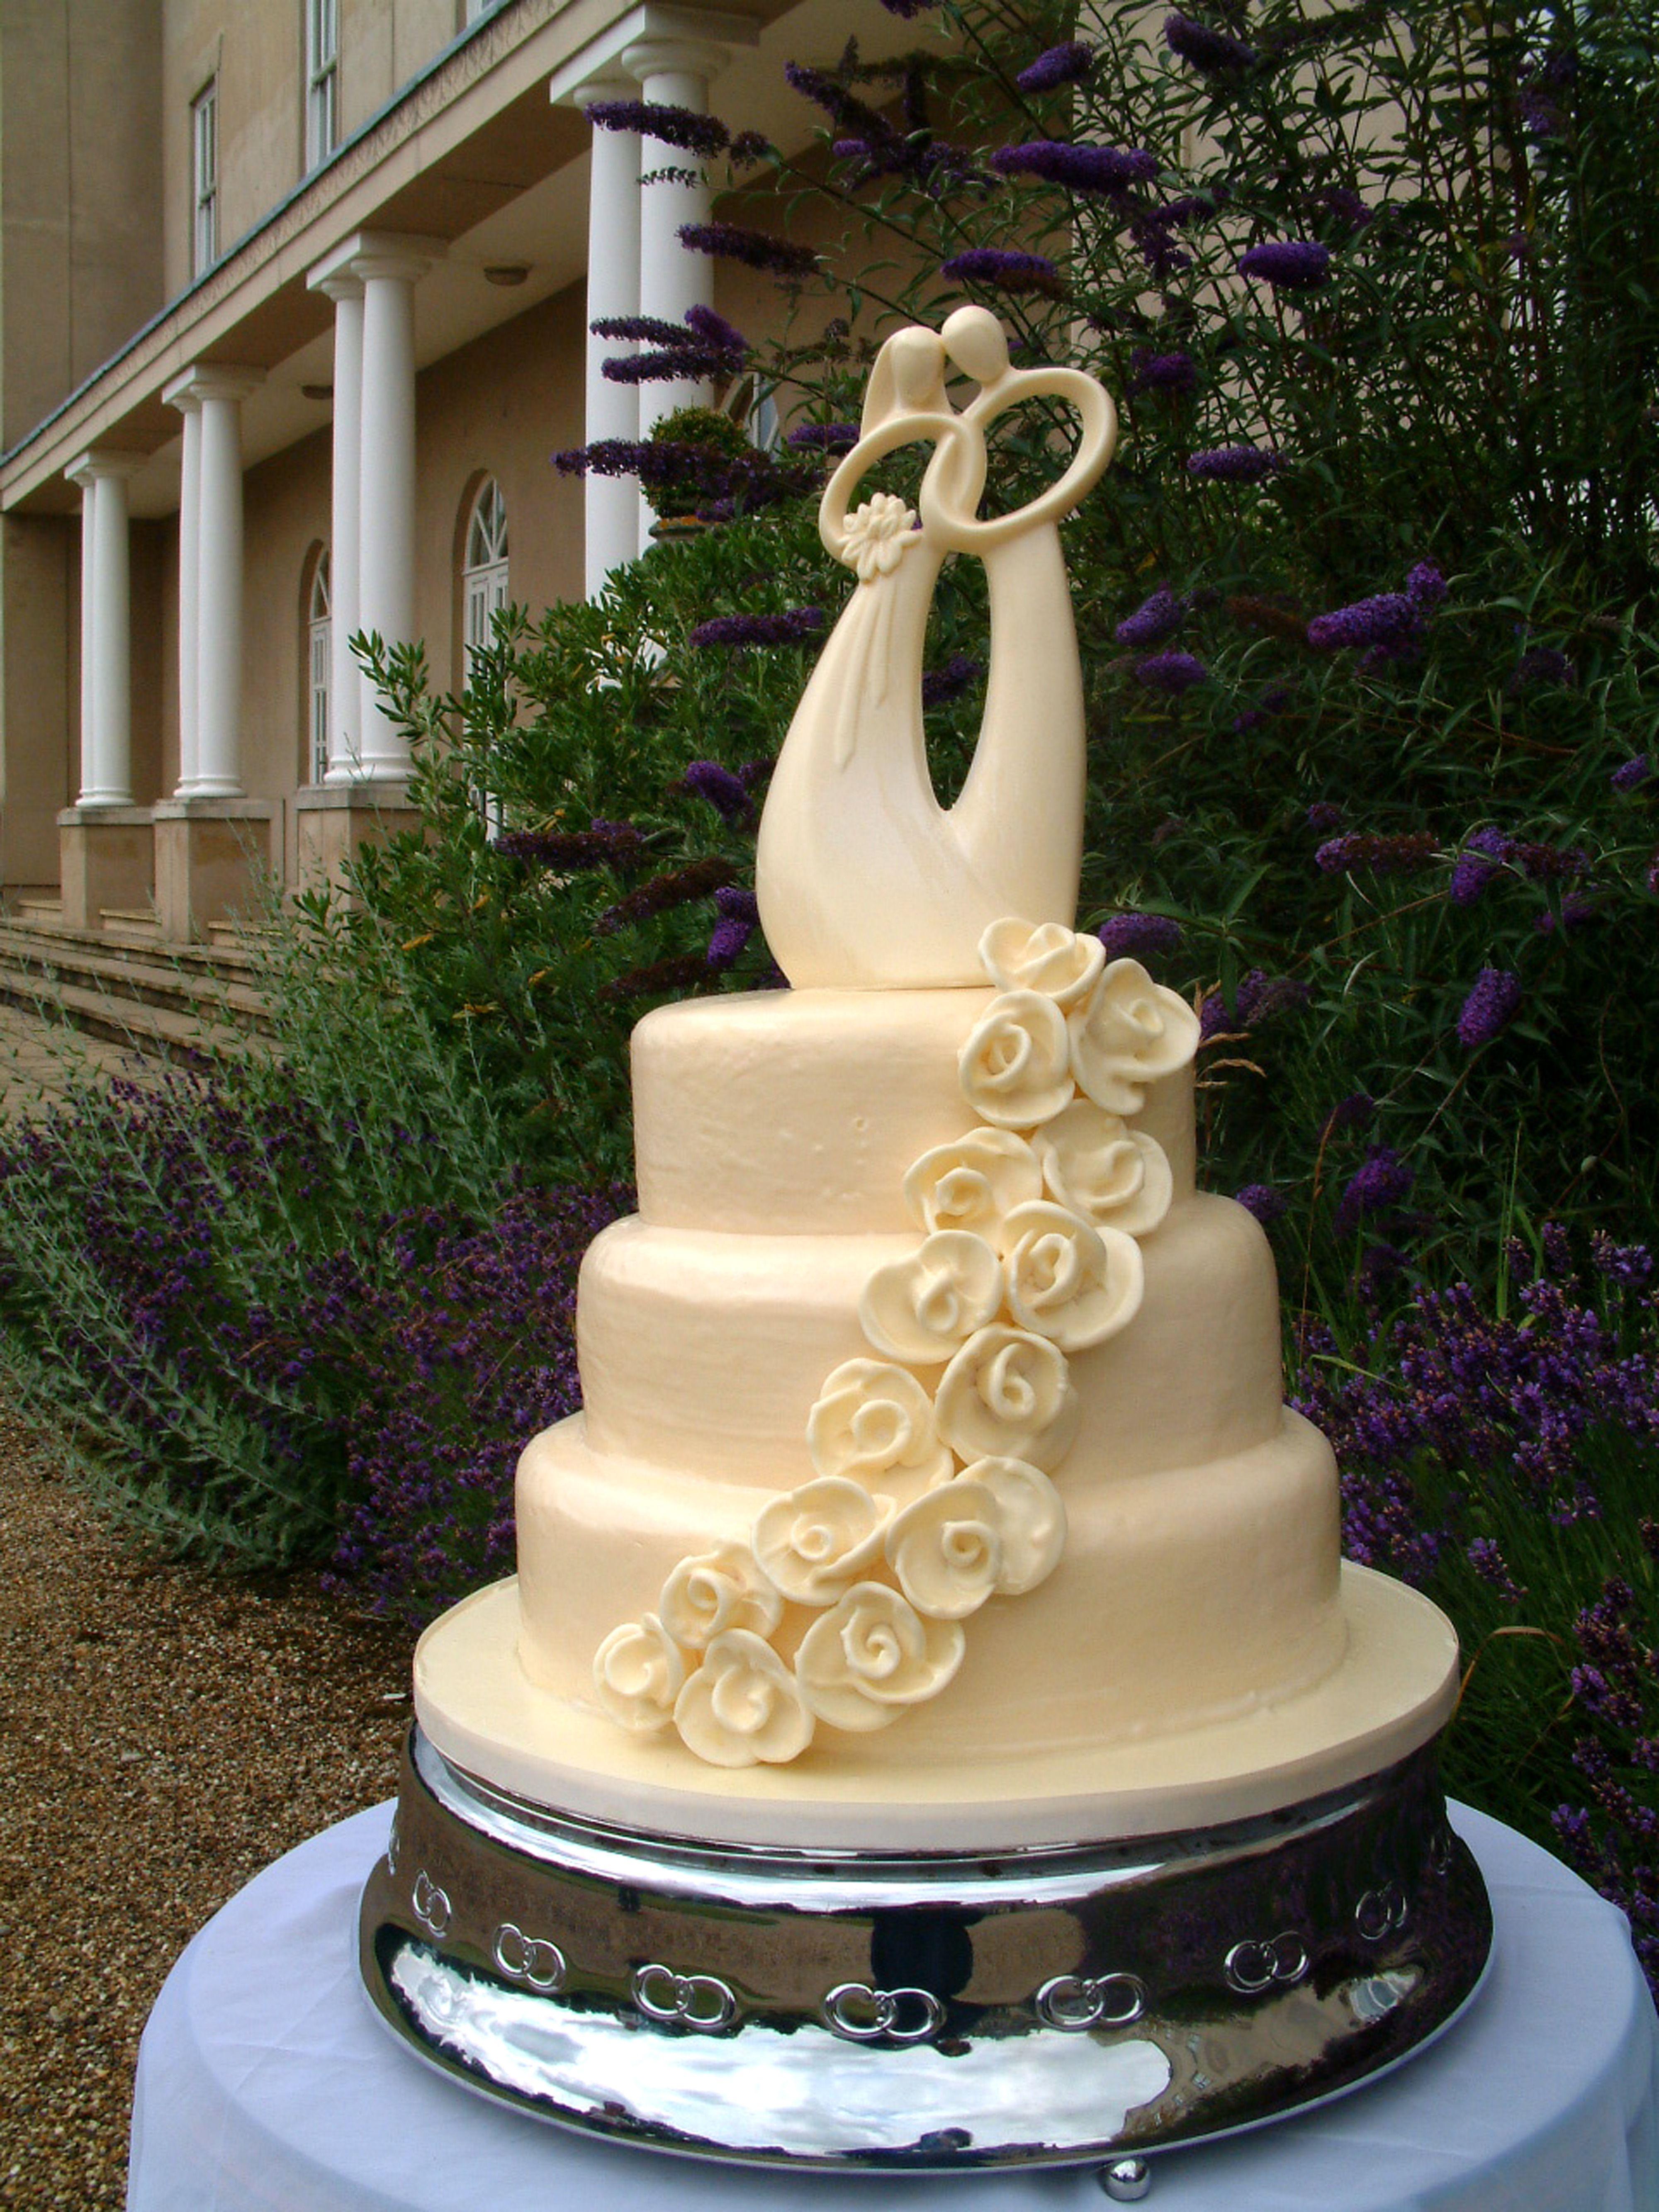 Sweethearts Chocolate Wedding Cake Design Tieredcakes Chocolateweddingcakes Chocolate Wedding Cake Reception Cake Wedding Reception Cake